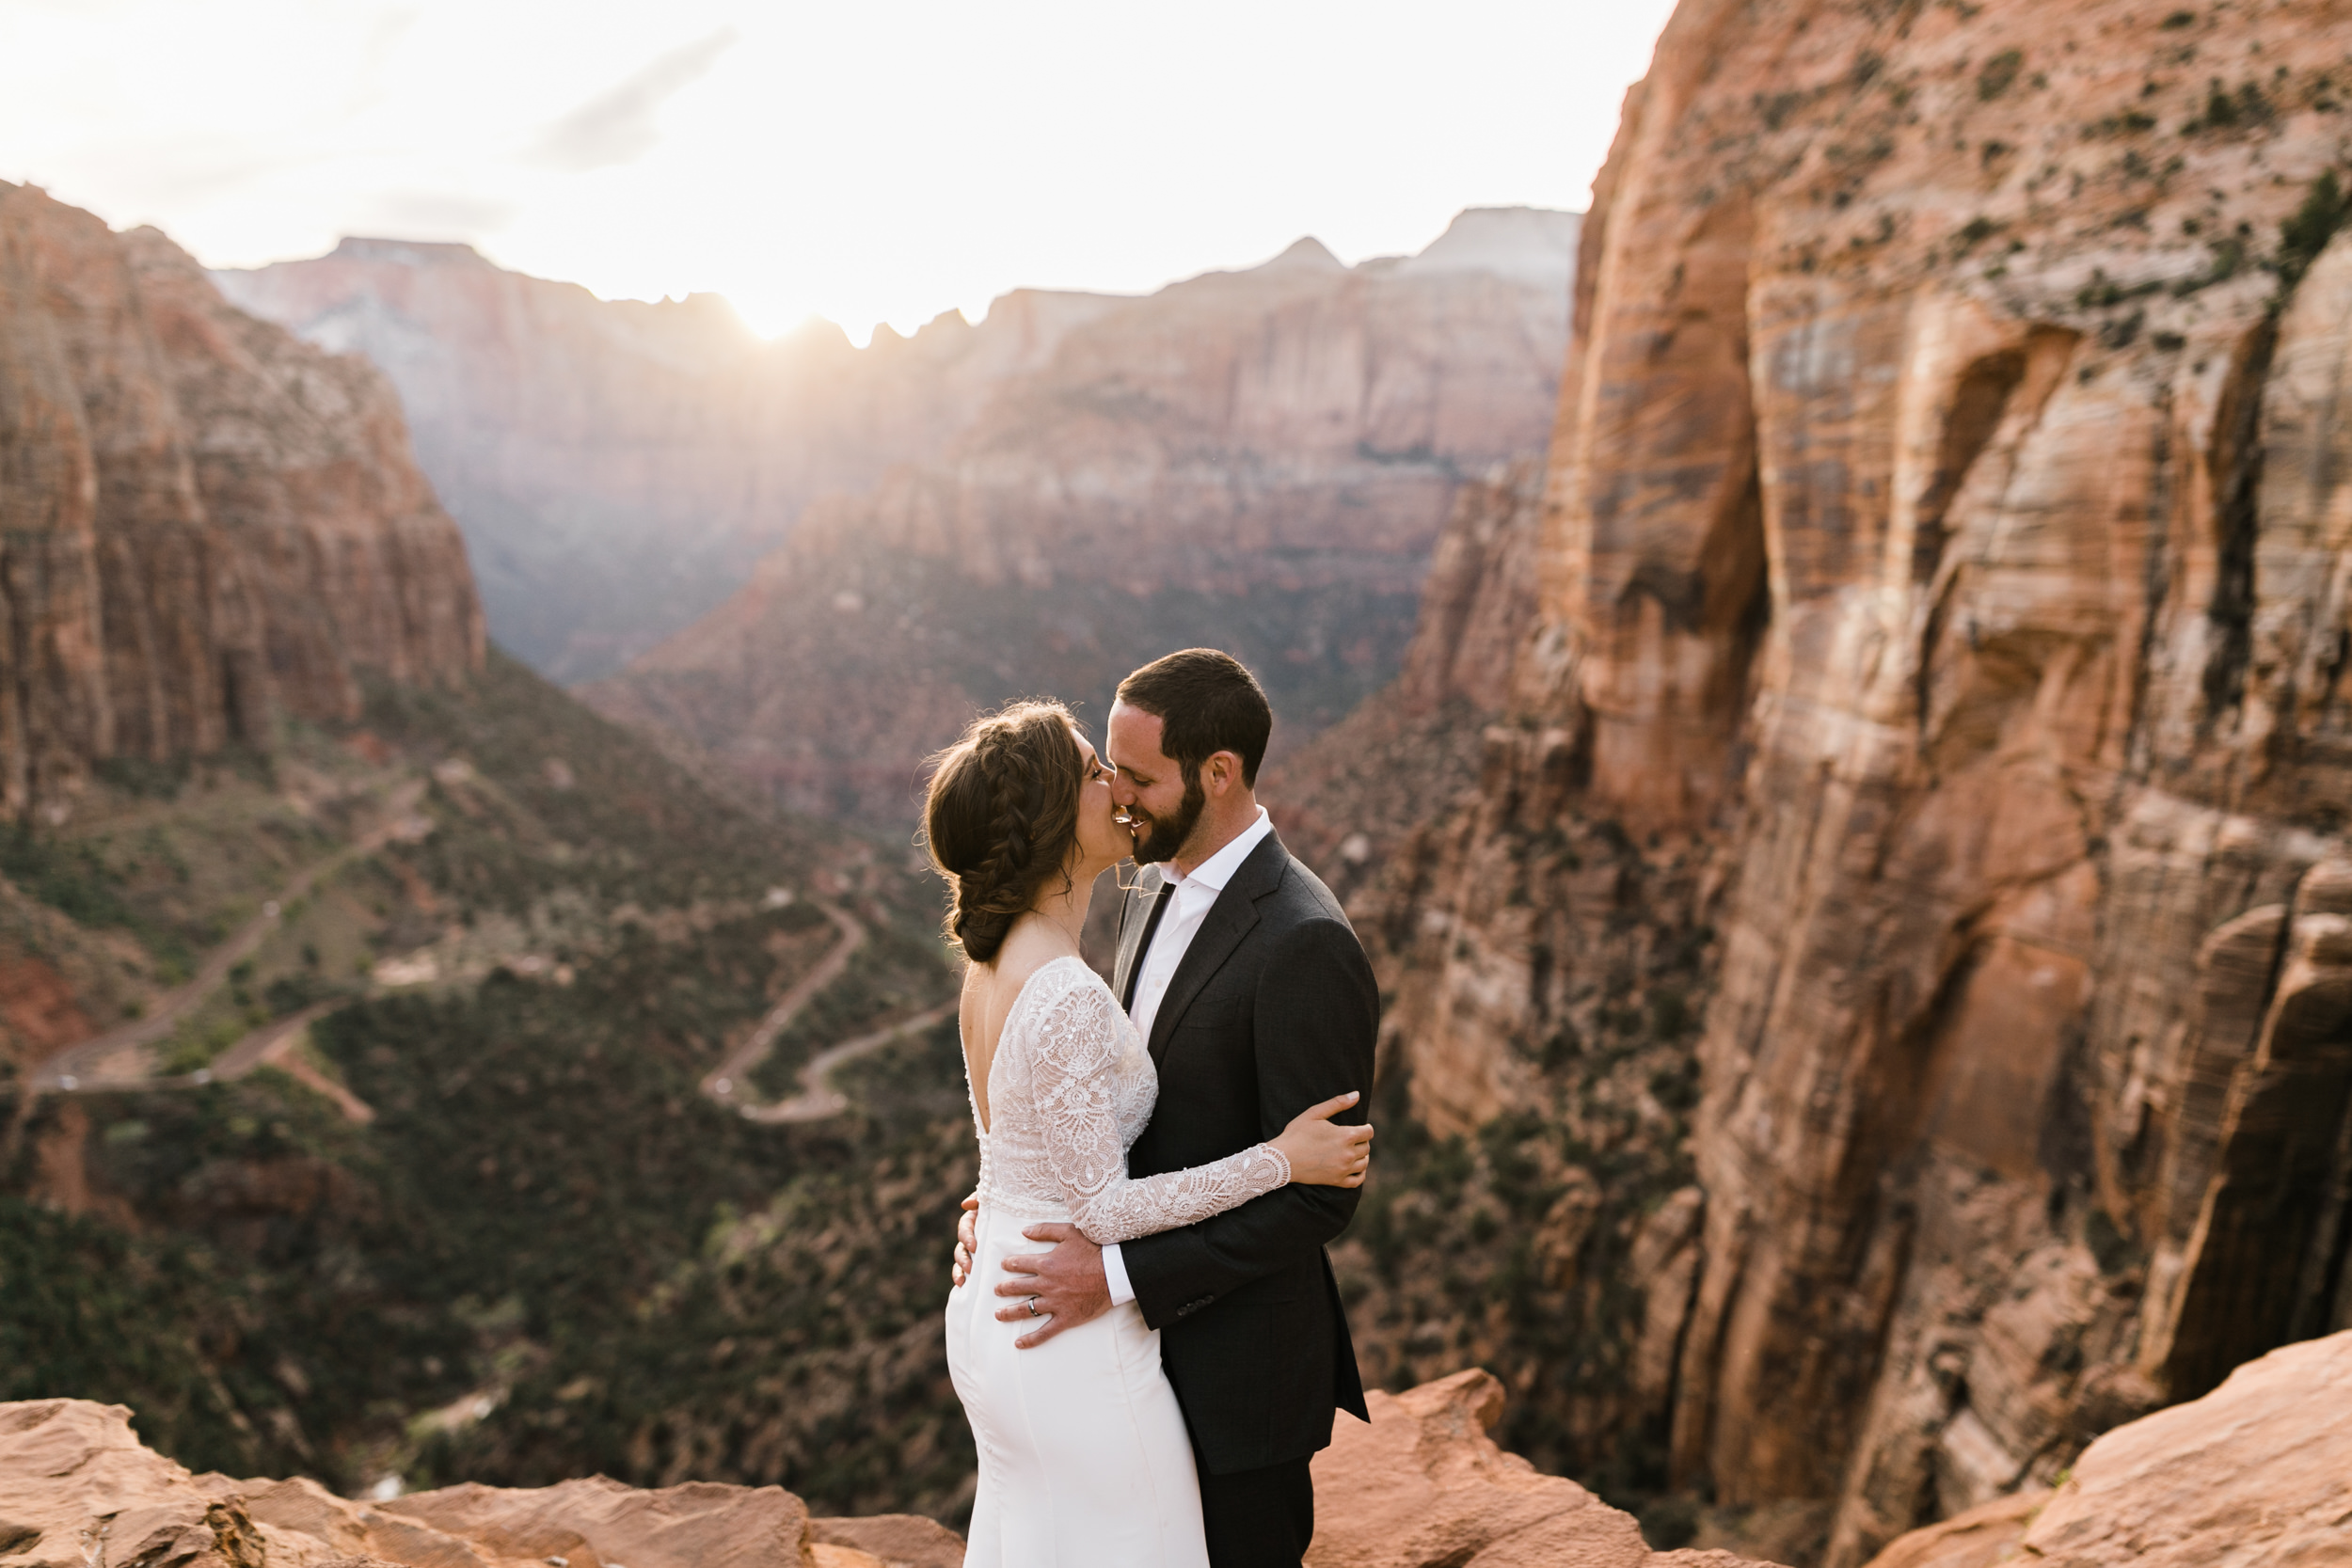 Zion-National-Park-Adventure-Wedding-Hearnes-Elopement-Photography-52.jpg